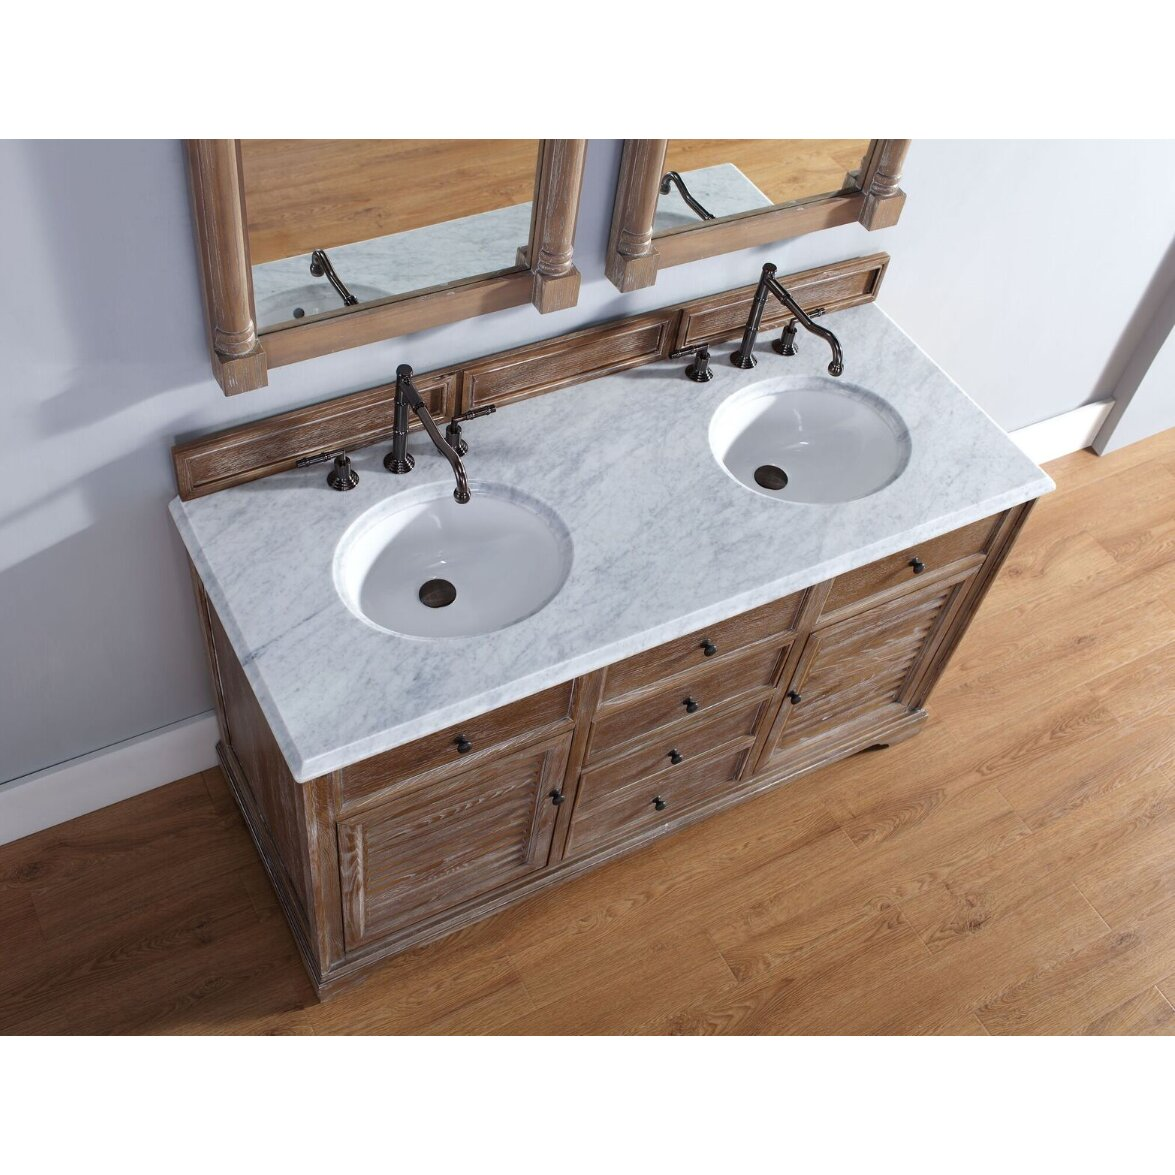 Driftwood Bathroom Vanity James Martin Furniture Savannah 60 Double Driftwood Bathroom